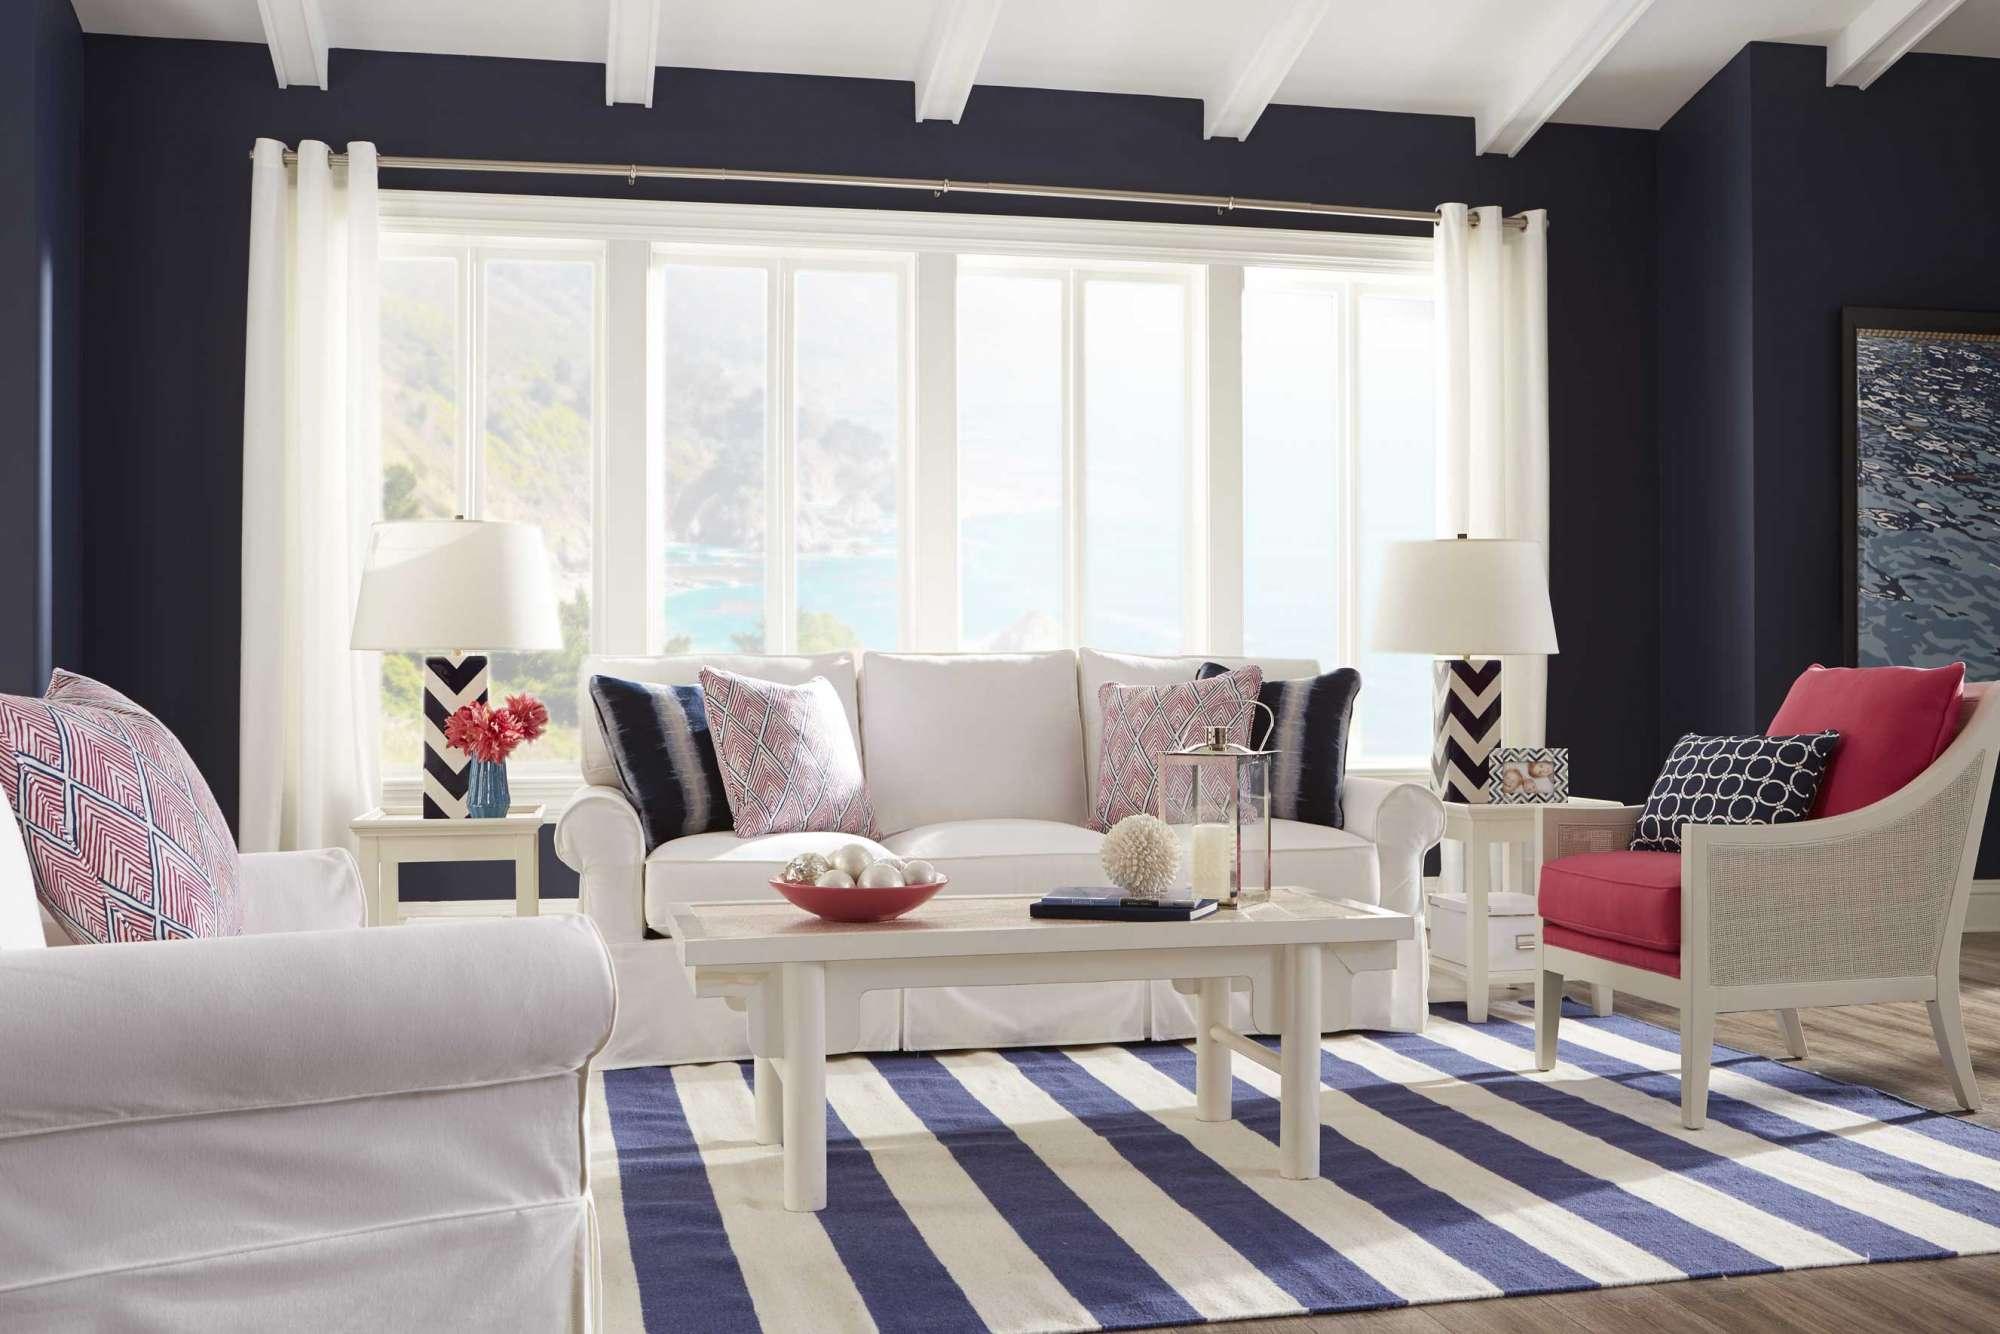 Custom Upholstered Furniture Makers #24: Find Your Inspiration